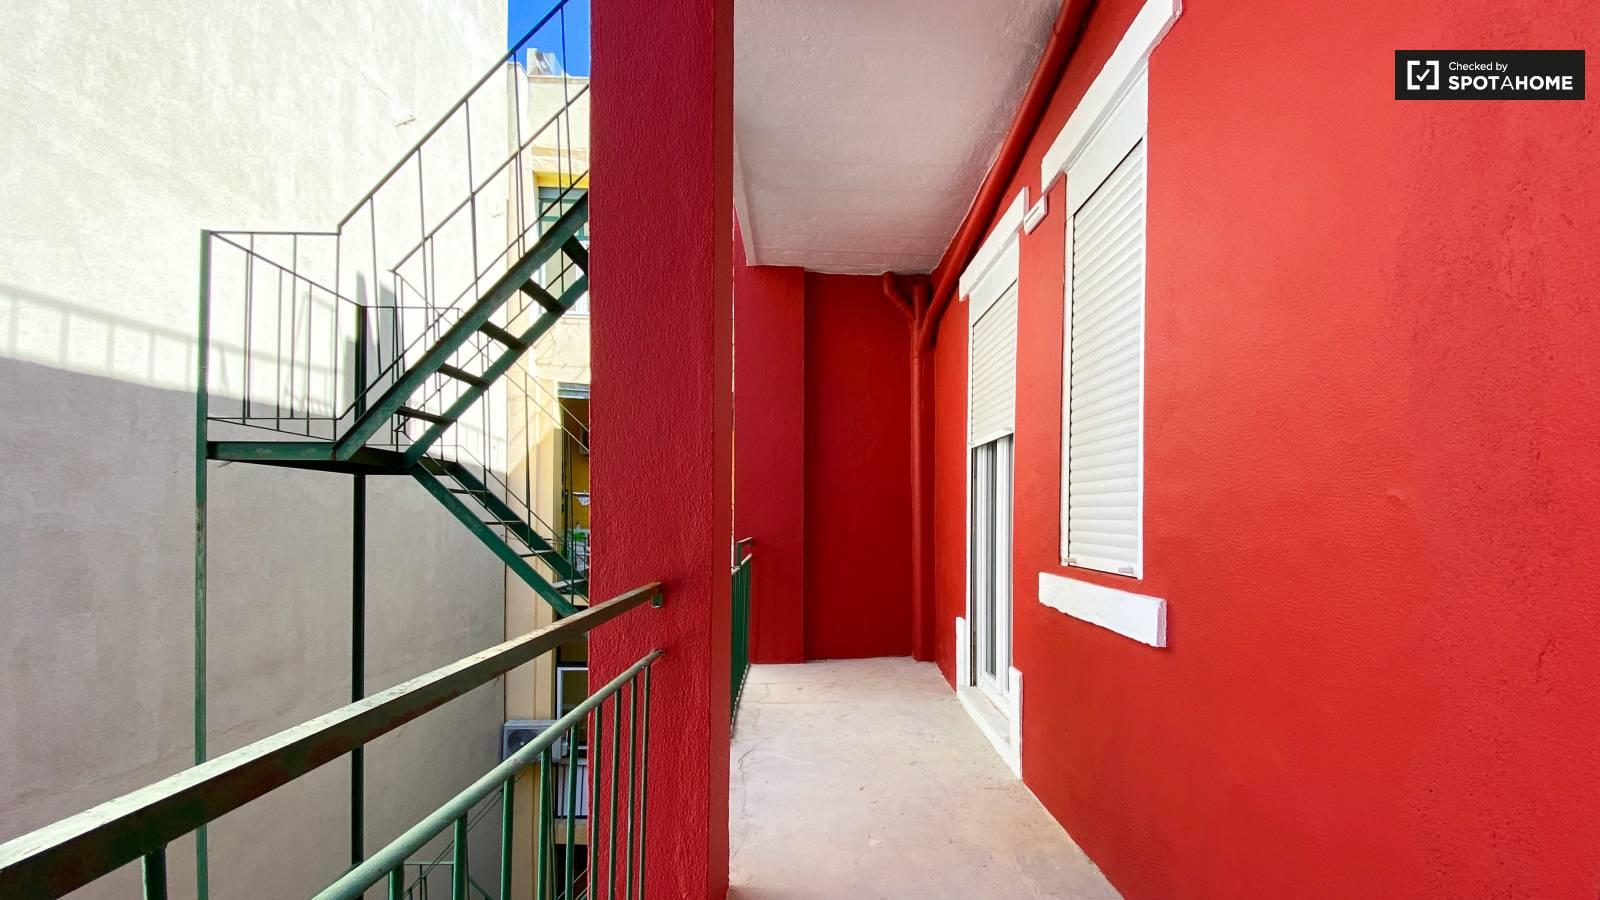 Bedroom 4 and 5's Balcony